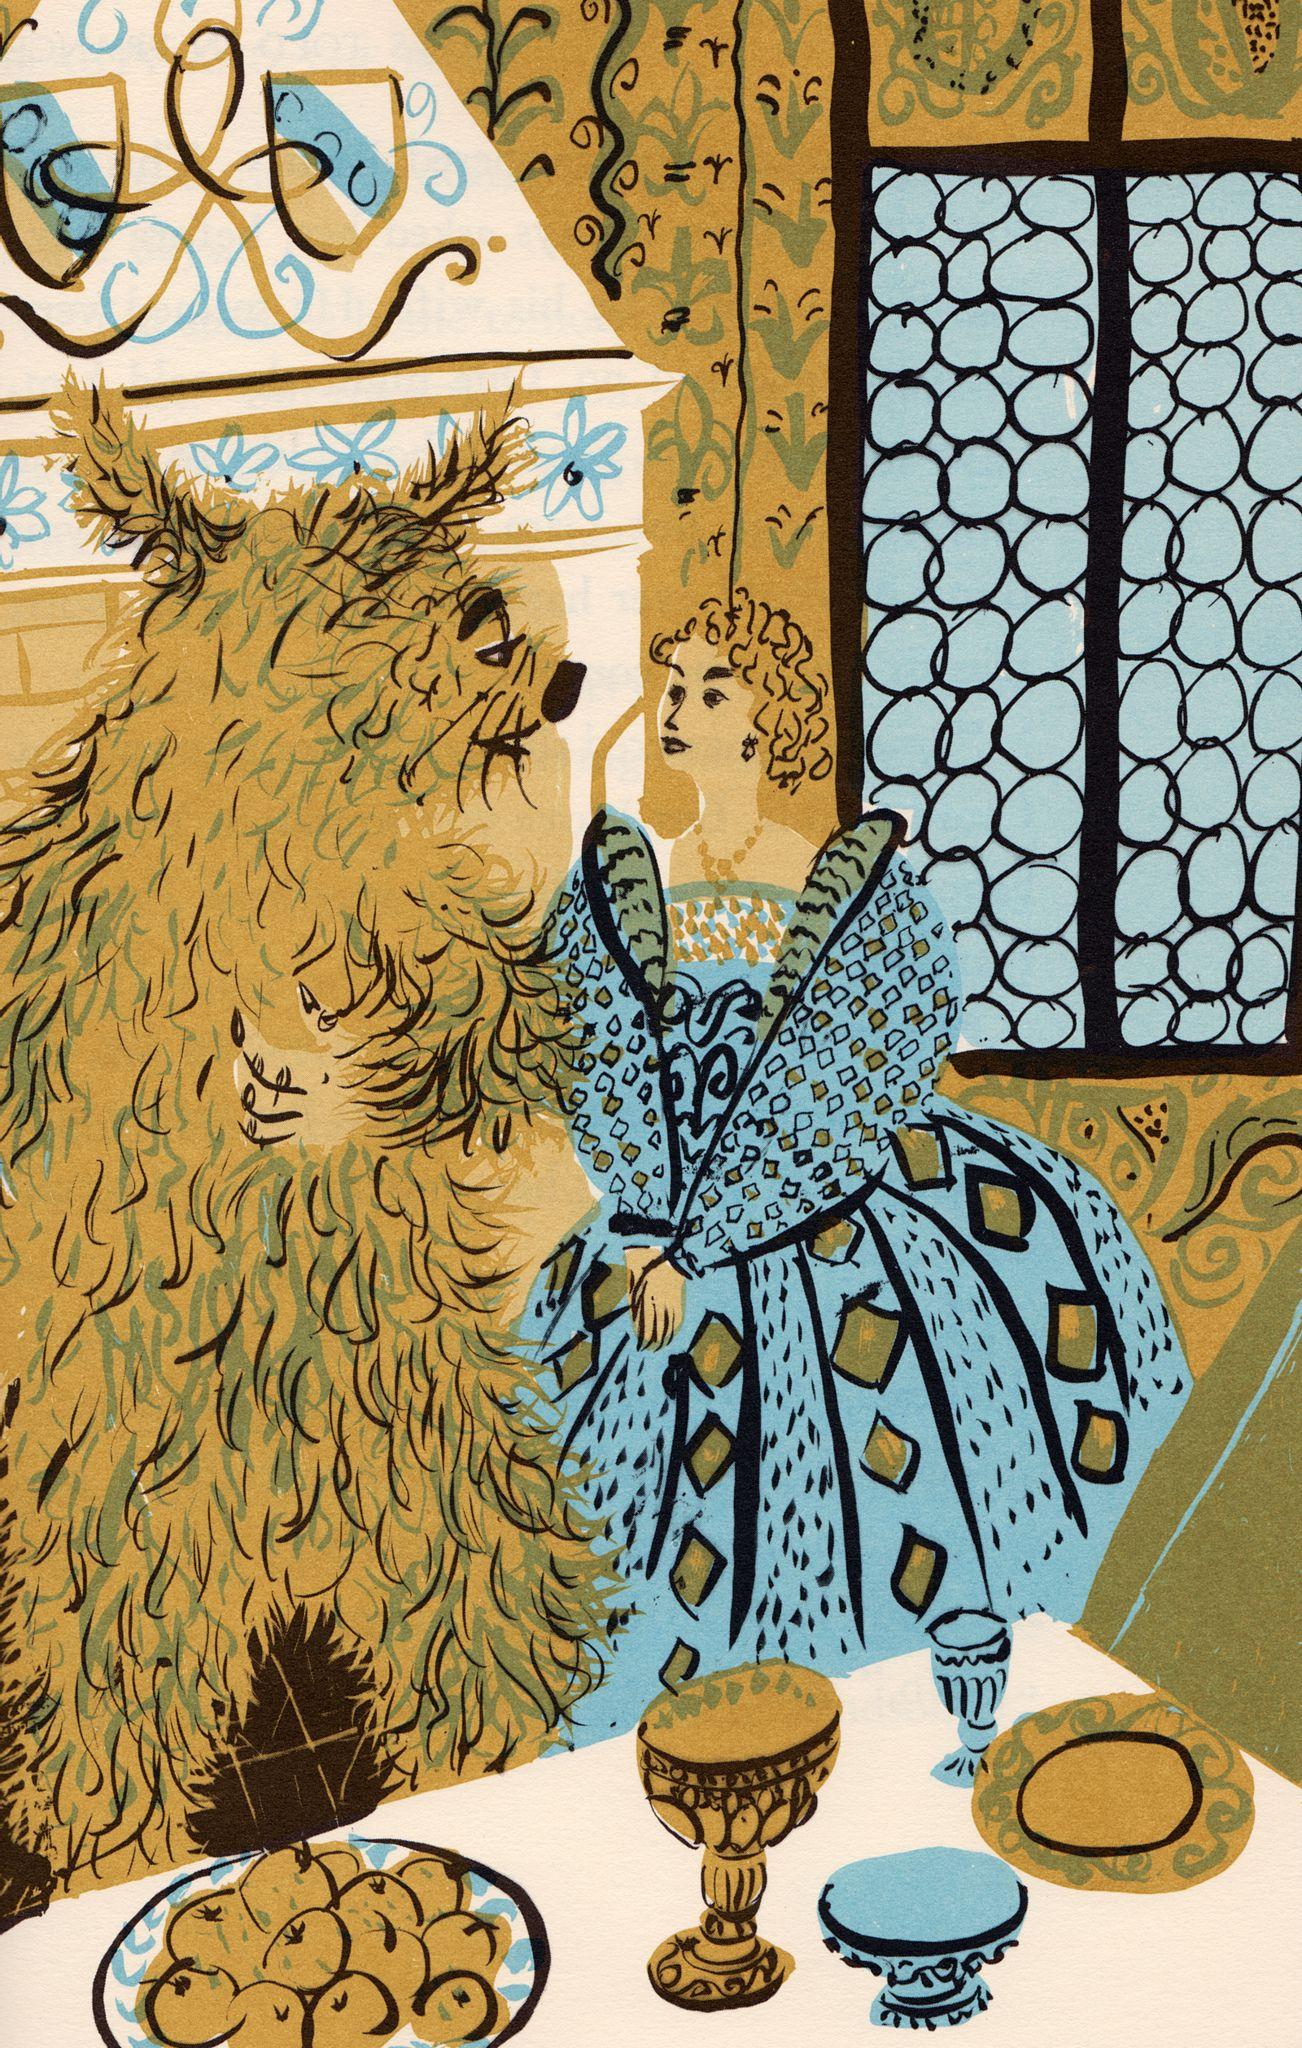 Roger Duvoisin | Иллюстрации, Сказки, Картинки